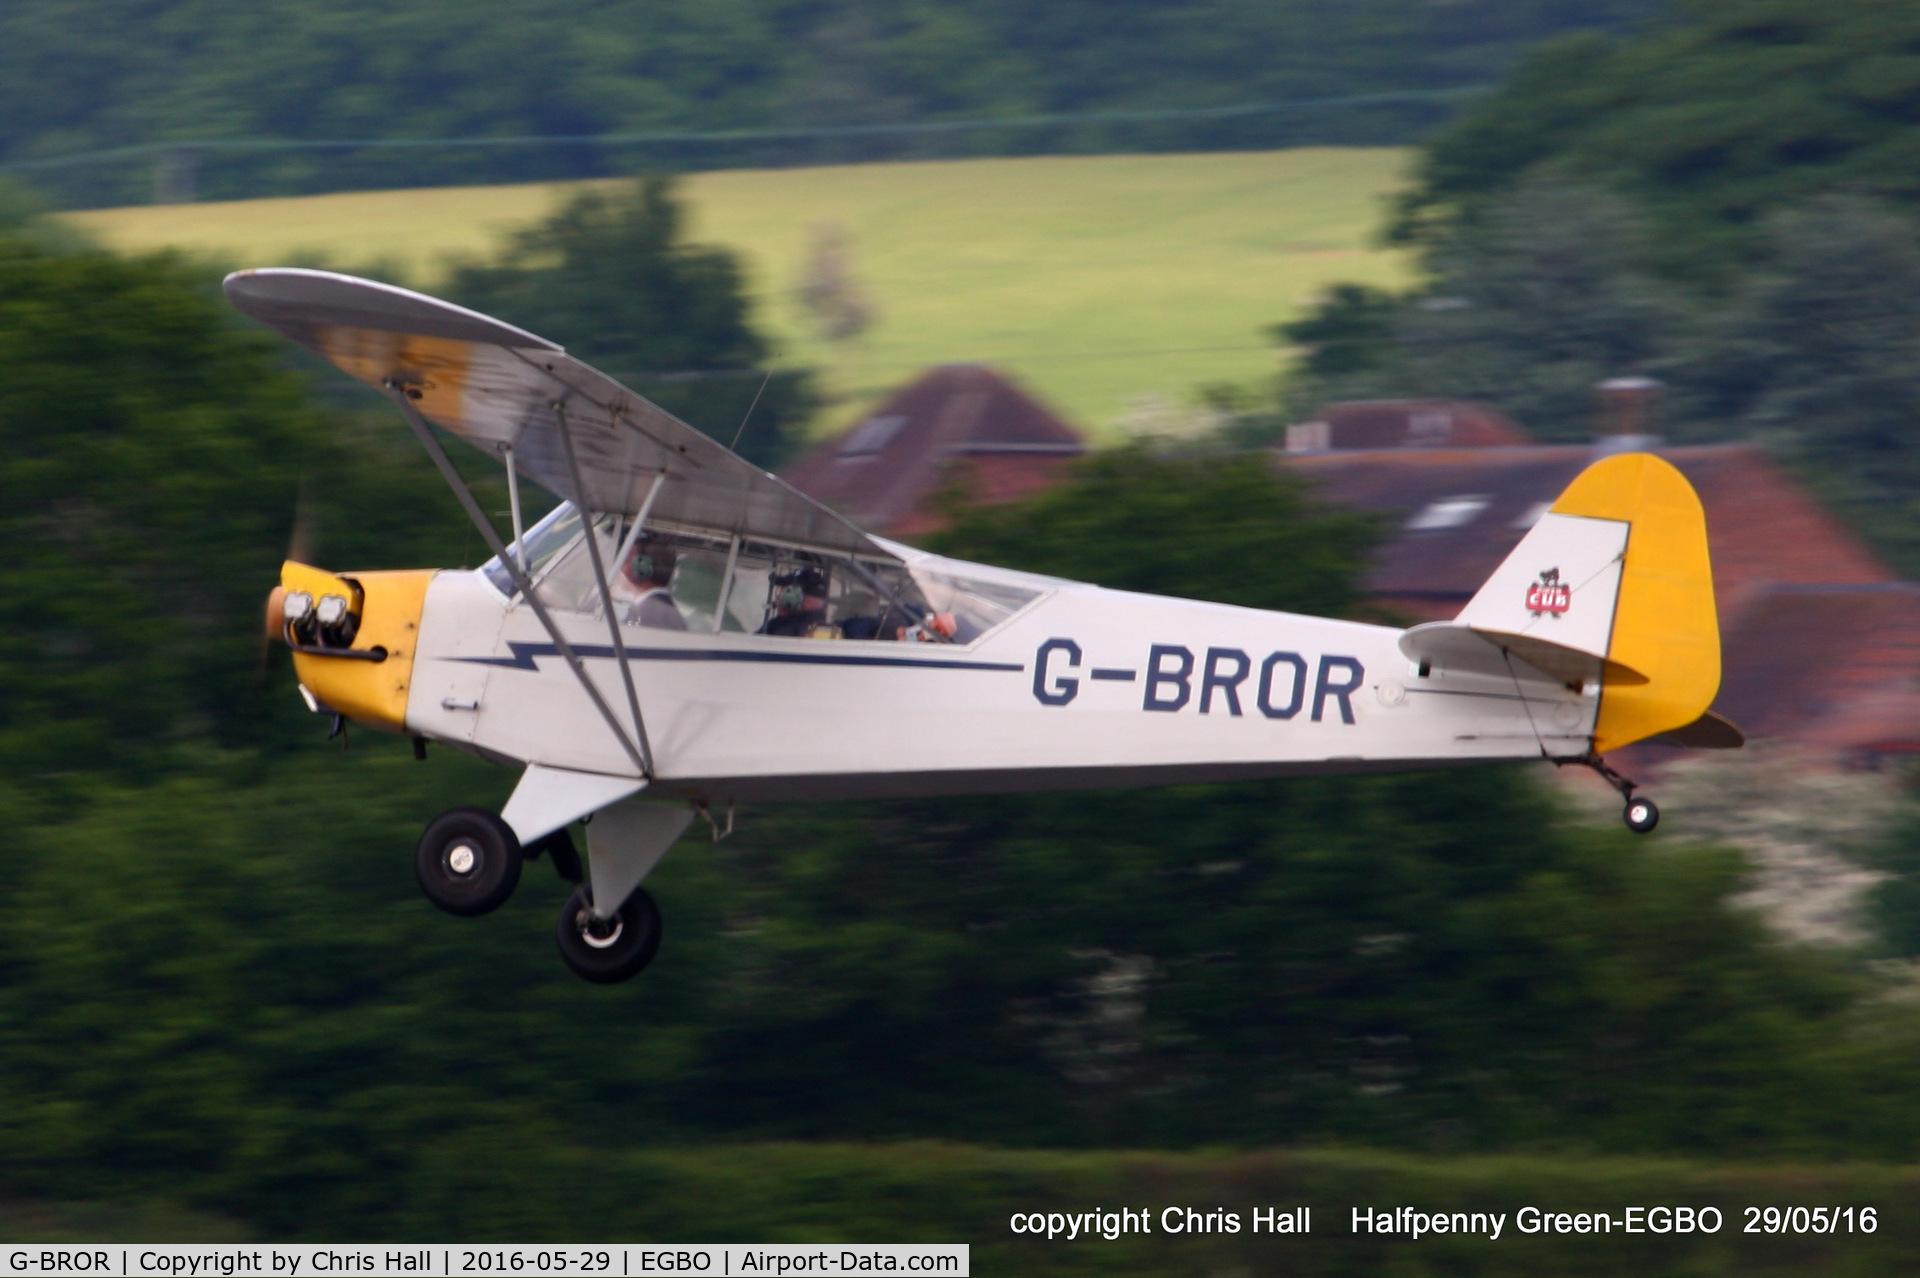 G-BROR, 1943 Piper L-4H Grasshopper (J3C-65D) C/N 10885, at Halfpenny Green